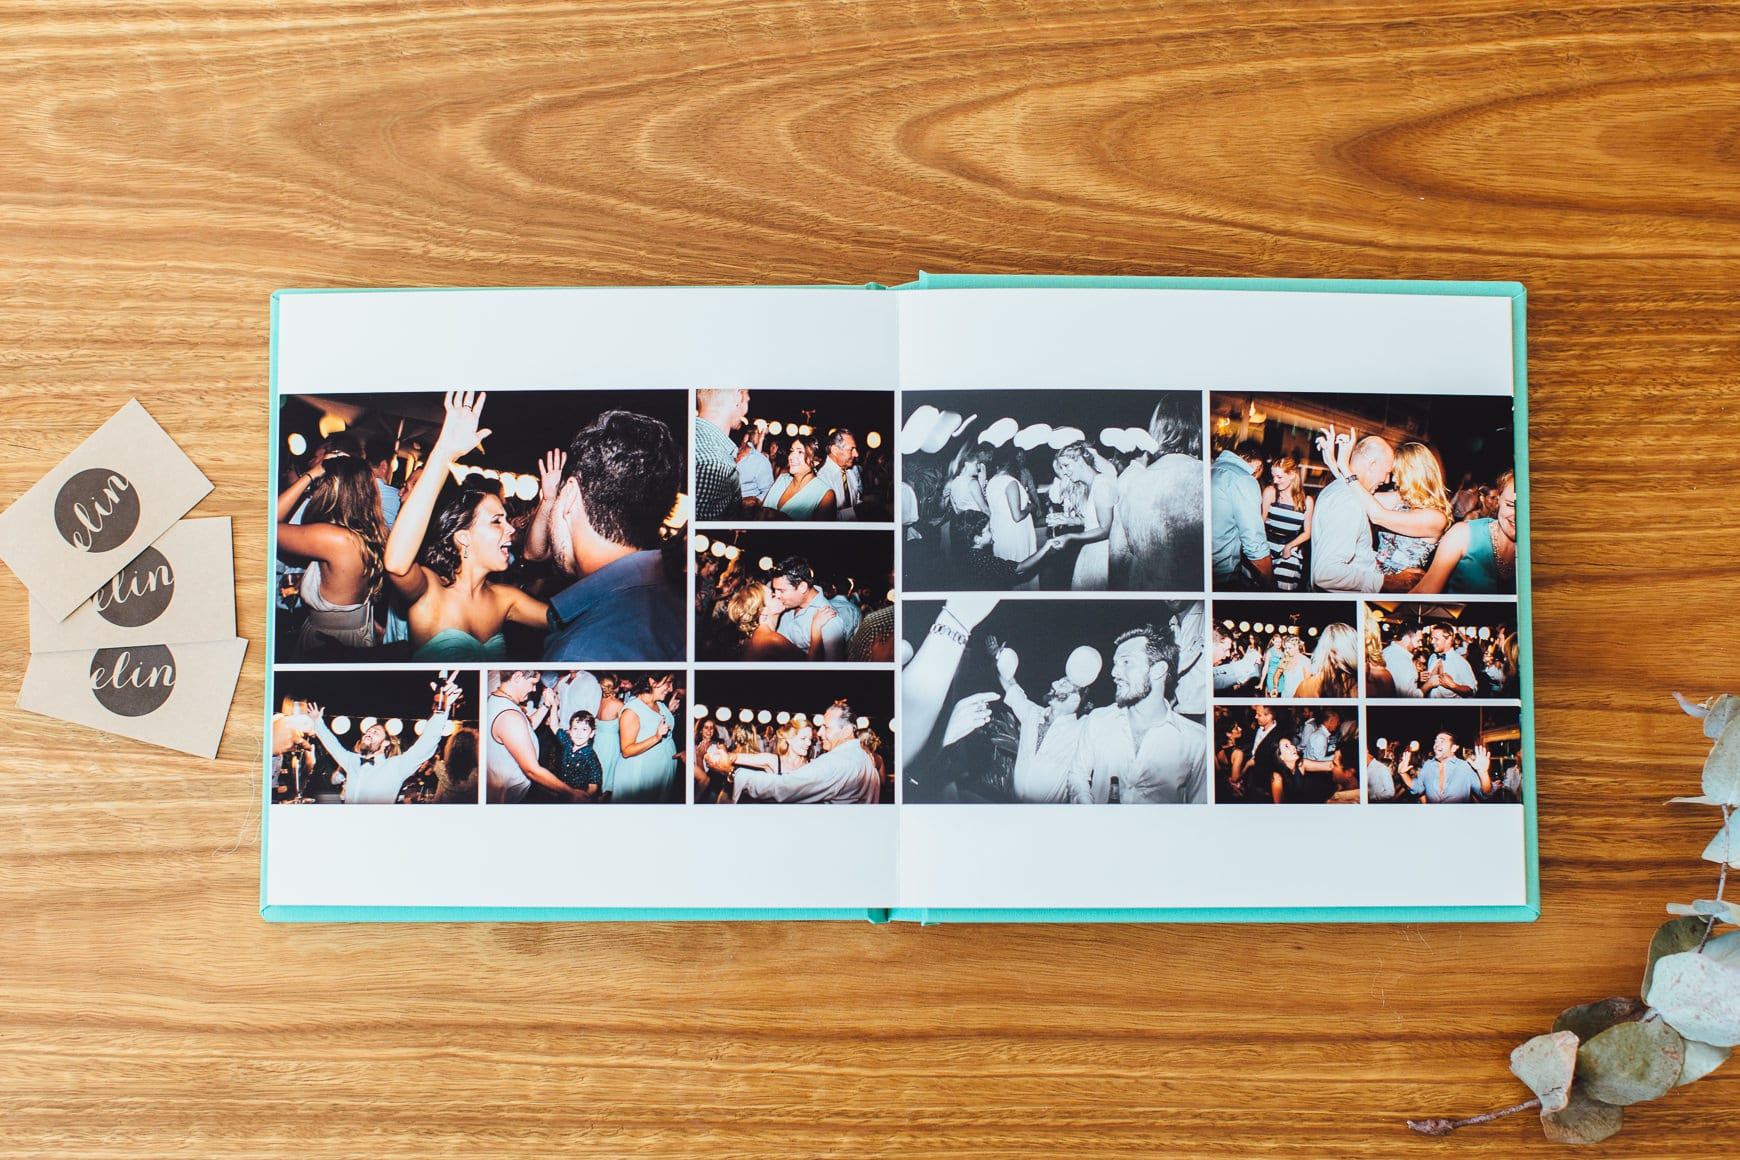 fine_art_time_machine_elin_bandmann_book017